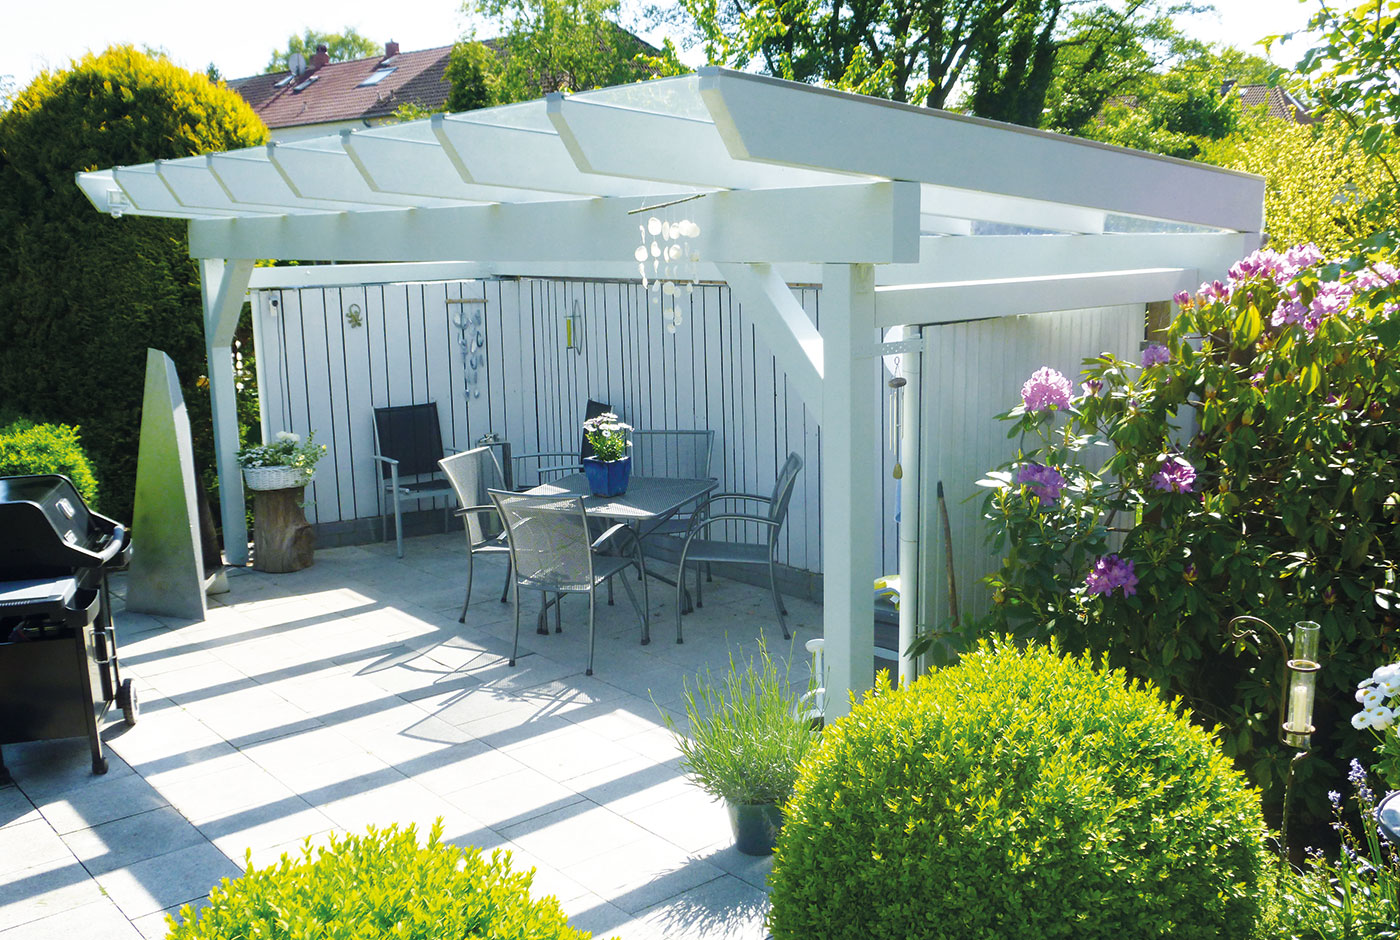 Gartengestaltung Outdoor Küche : Günstige outdoorküche für den garten dank kochplatte bierzelt